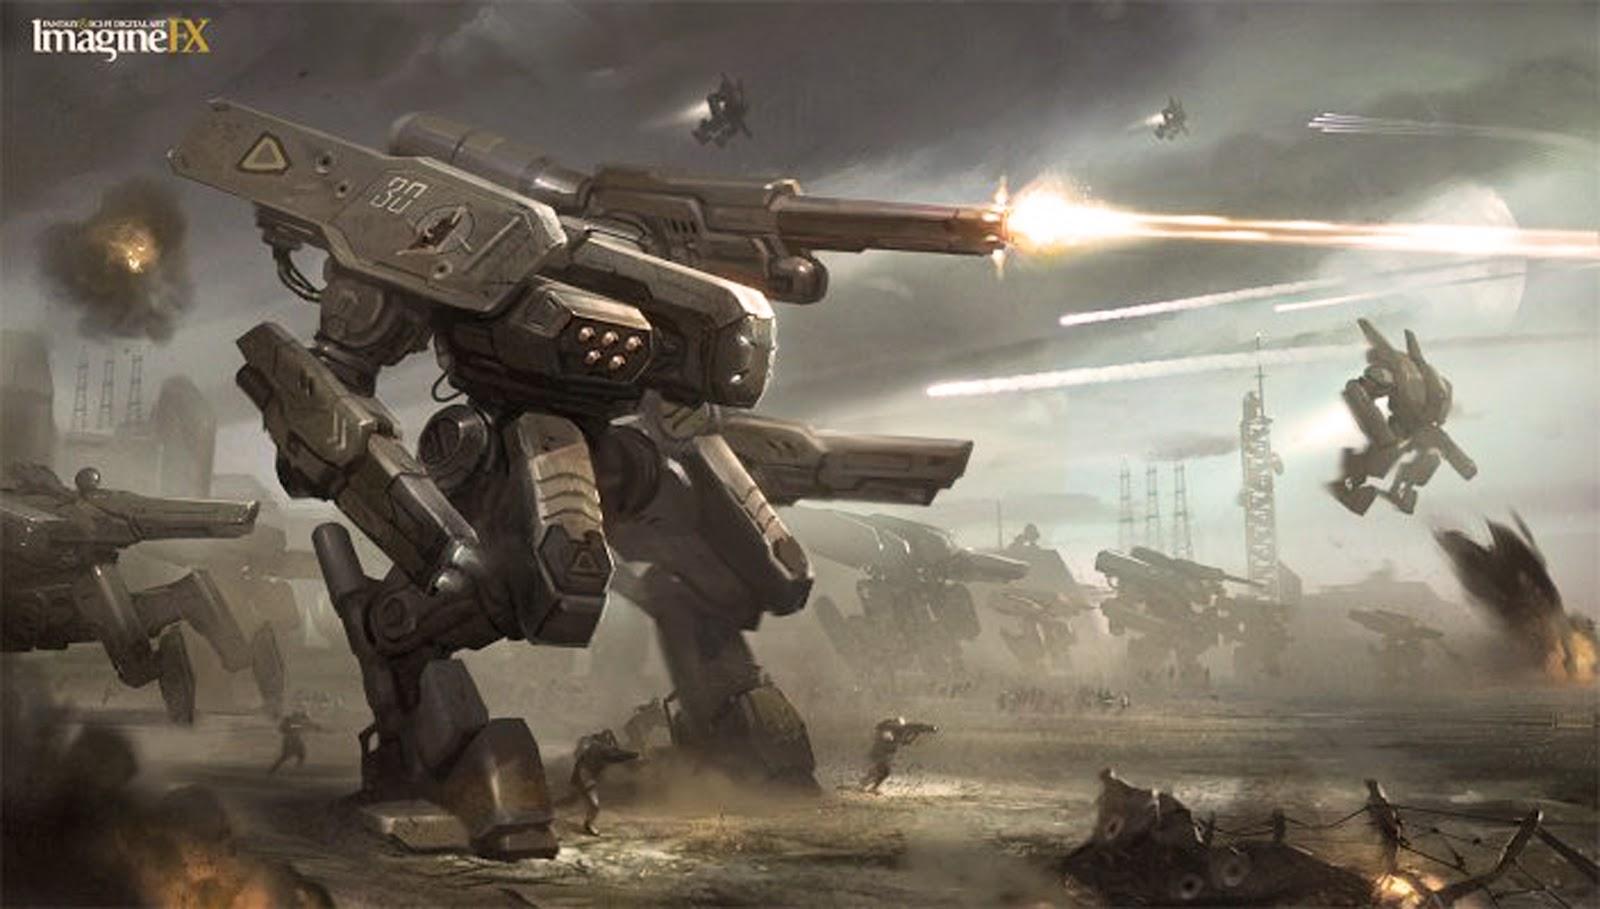 La Bataille de Themyscira [Brainiac : WotFC] Mech+mecha+giant+robot+concept+art+design+gundam+villain+decepticon+hunter+drone+transformers+2+3+4+movie+sci+fi+wallpaper++Mech+Army+by+Twitchfinger